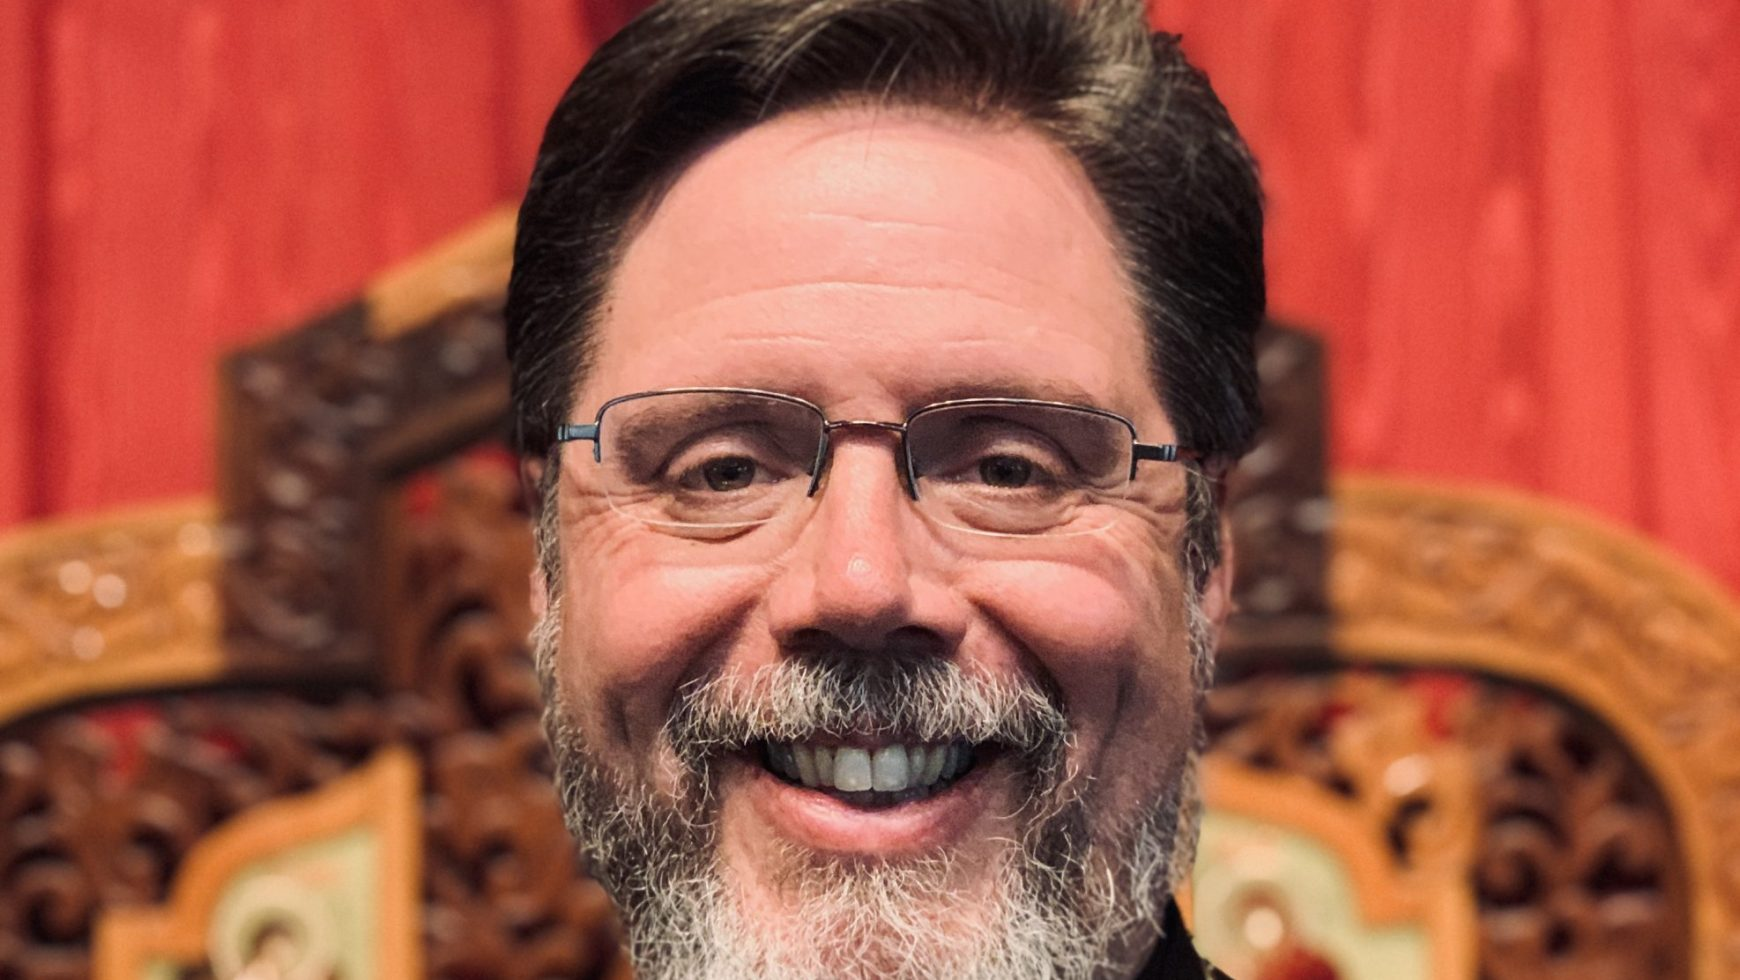 Fr. K. Michael Anderson